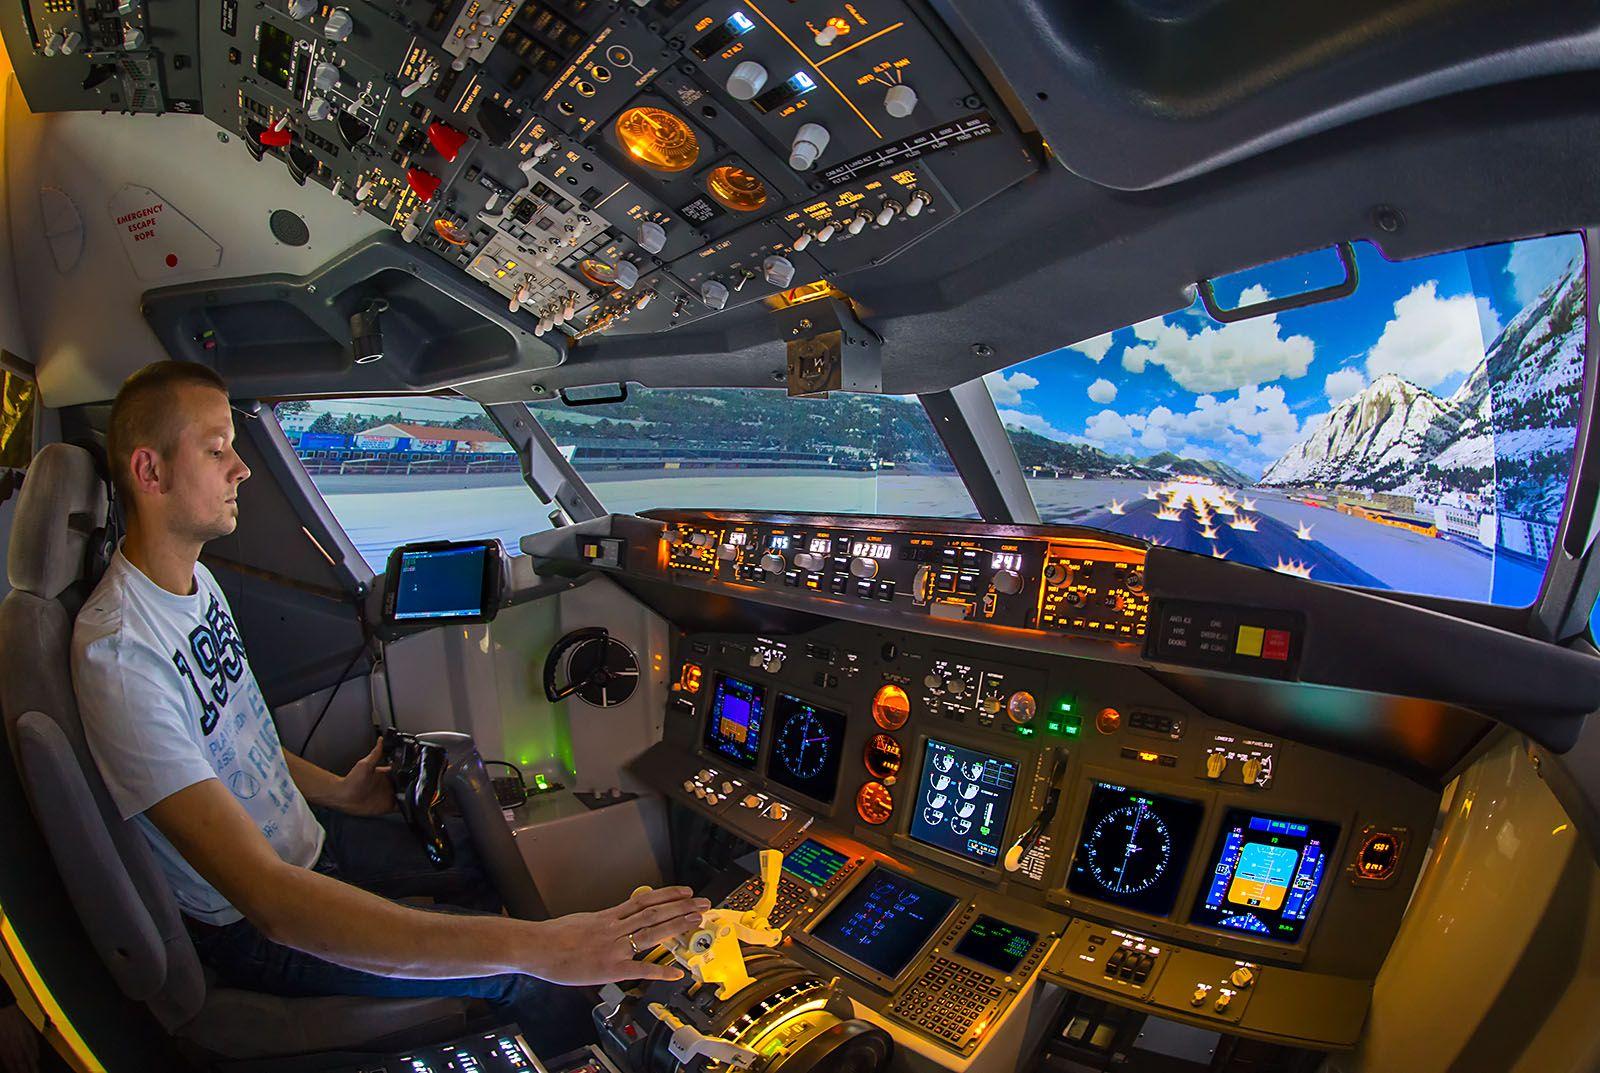 X Plane Simulation Video Game Rooms Flight Simulator Cockpit